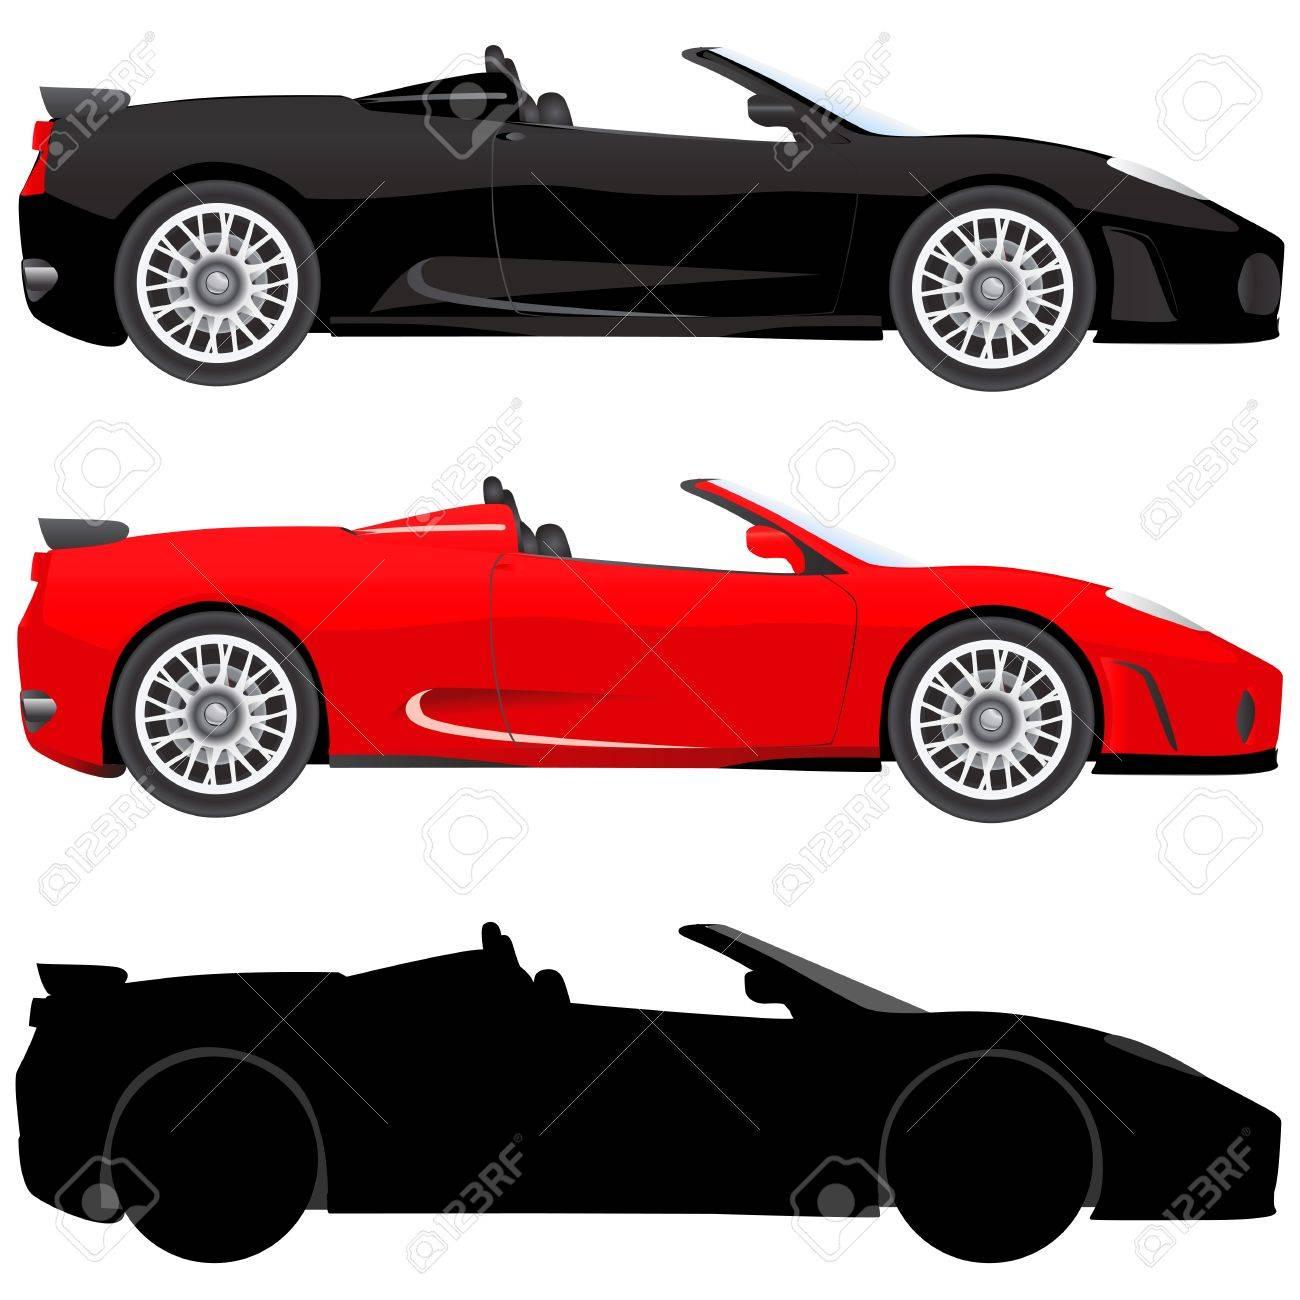 exotic car (illustration in detail) Stock Vector - 9447440